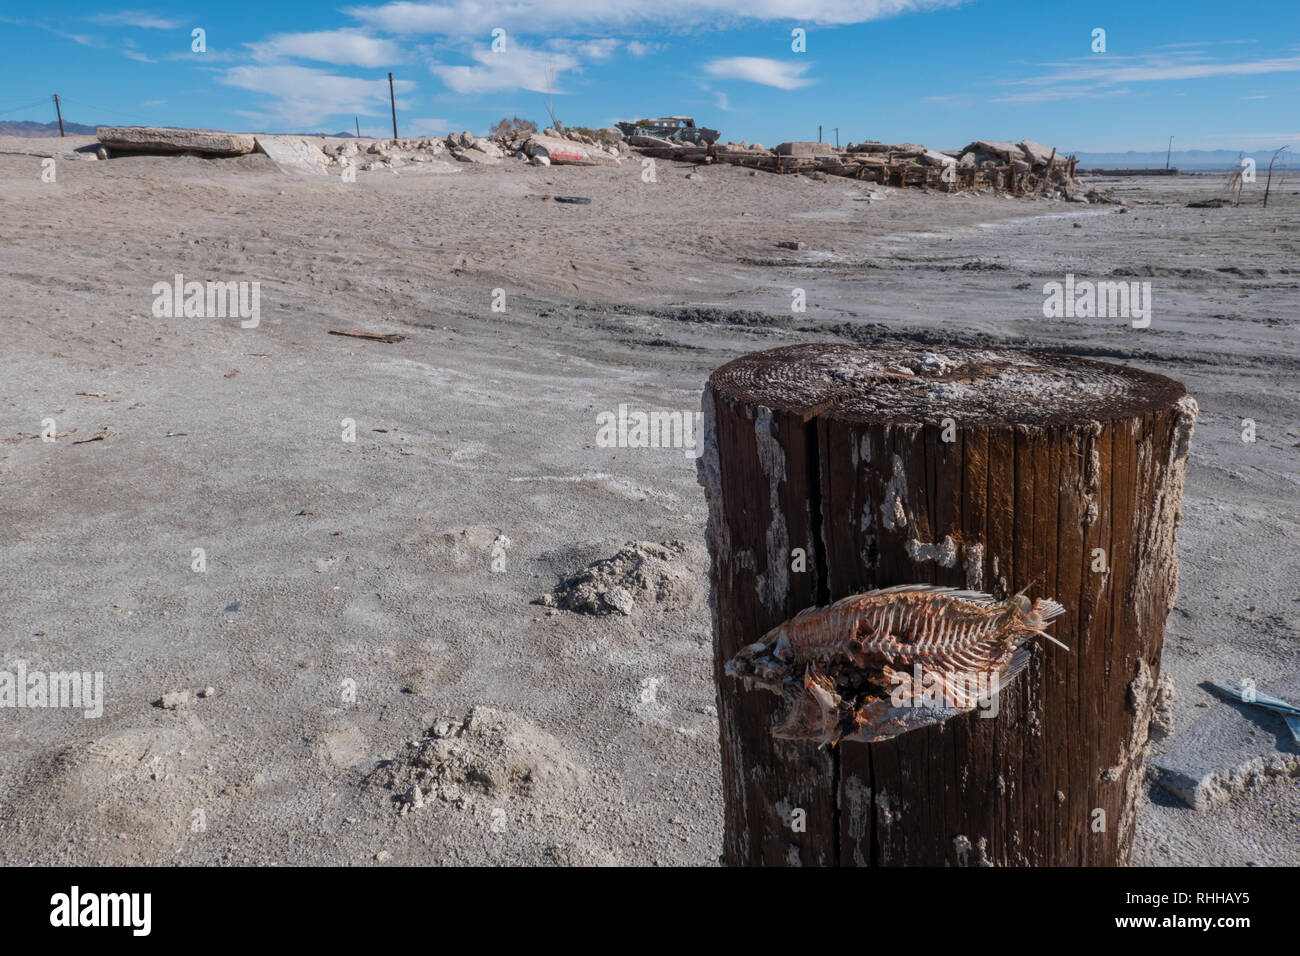 Dead Fish By The Salton Sea Stock Photos & Dead Fish By The Salton